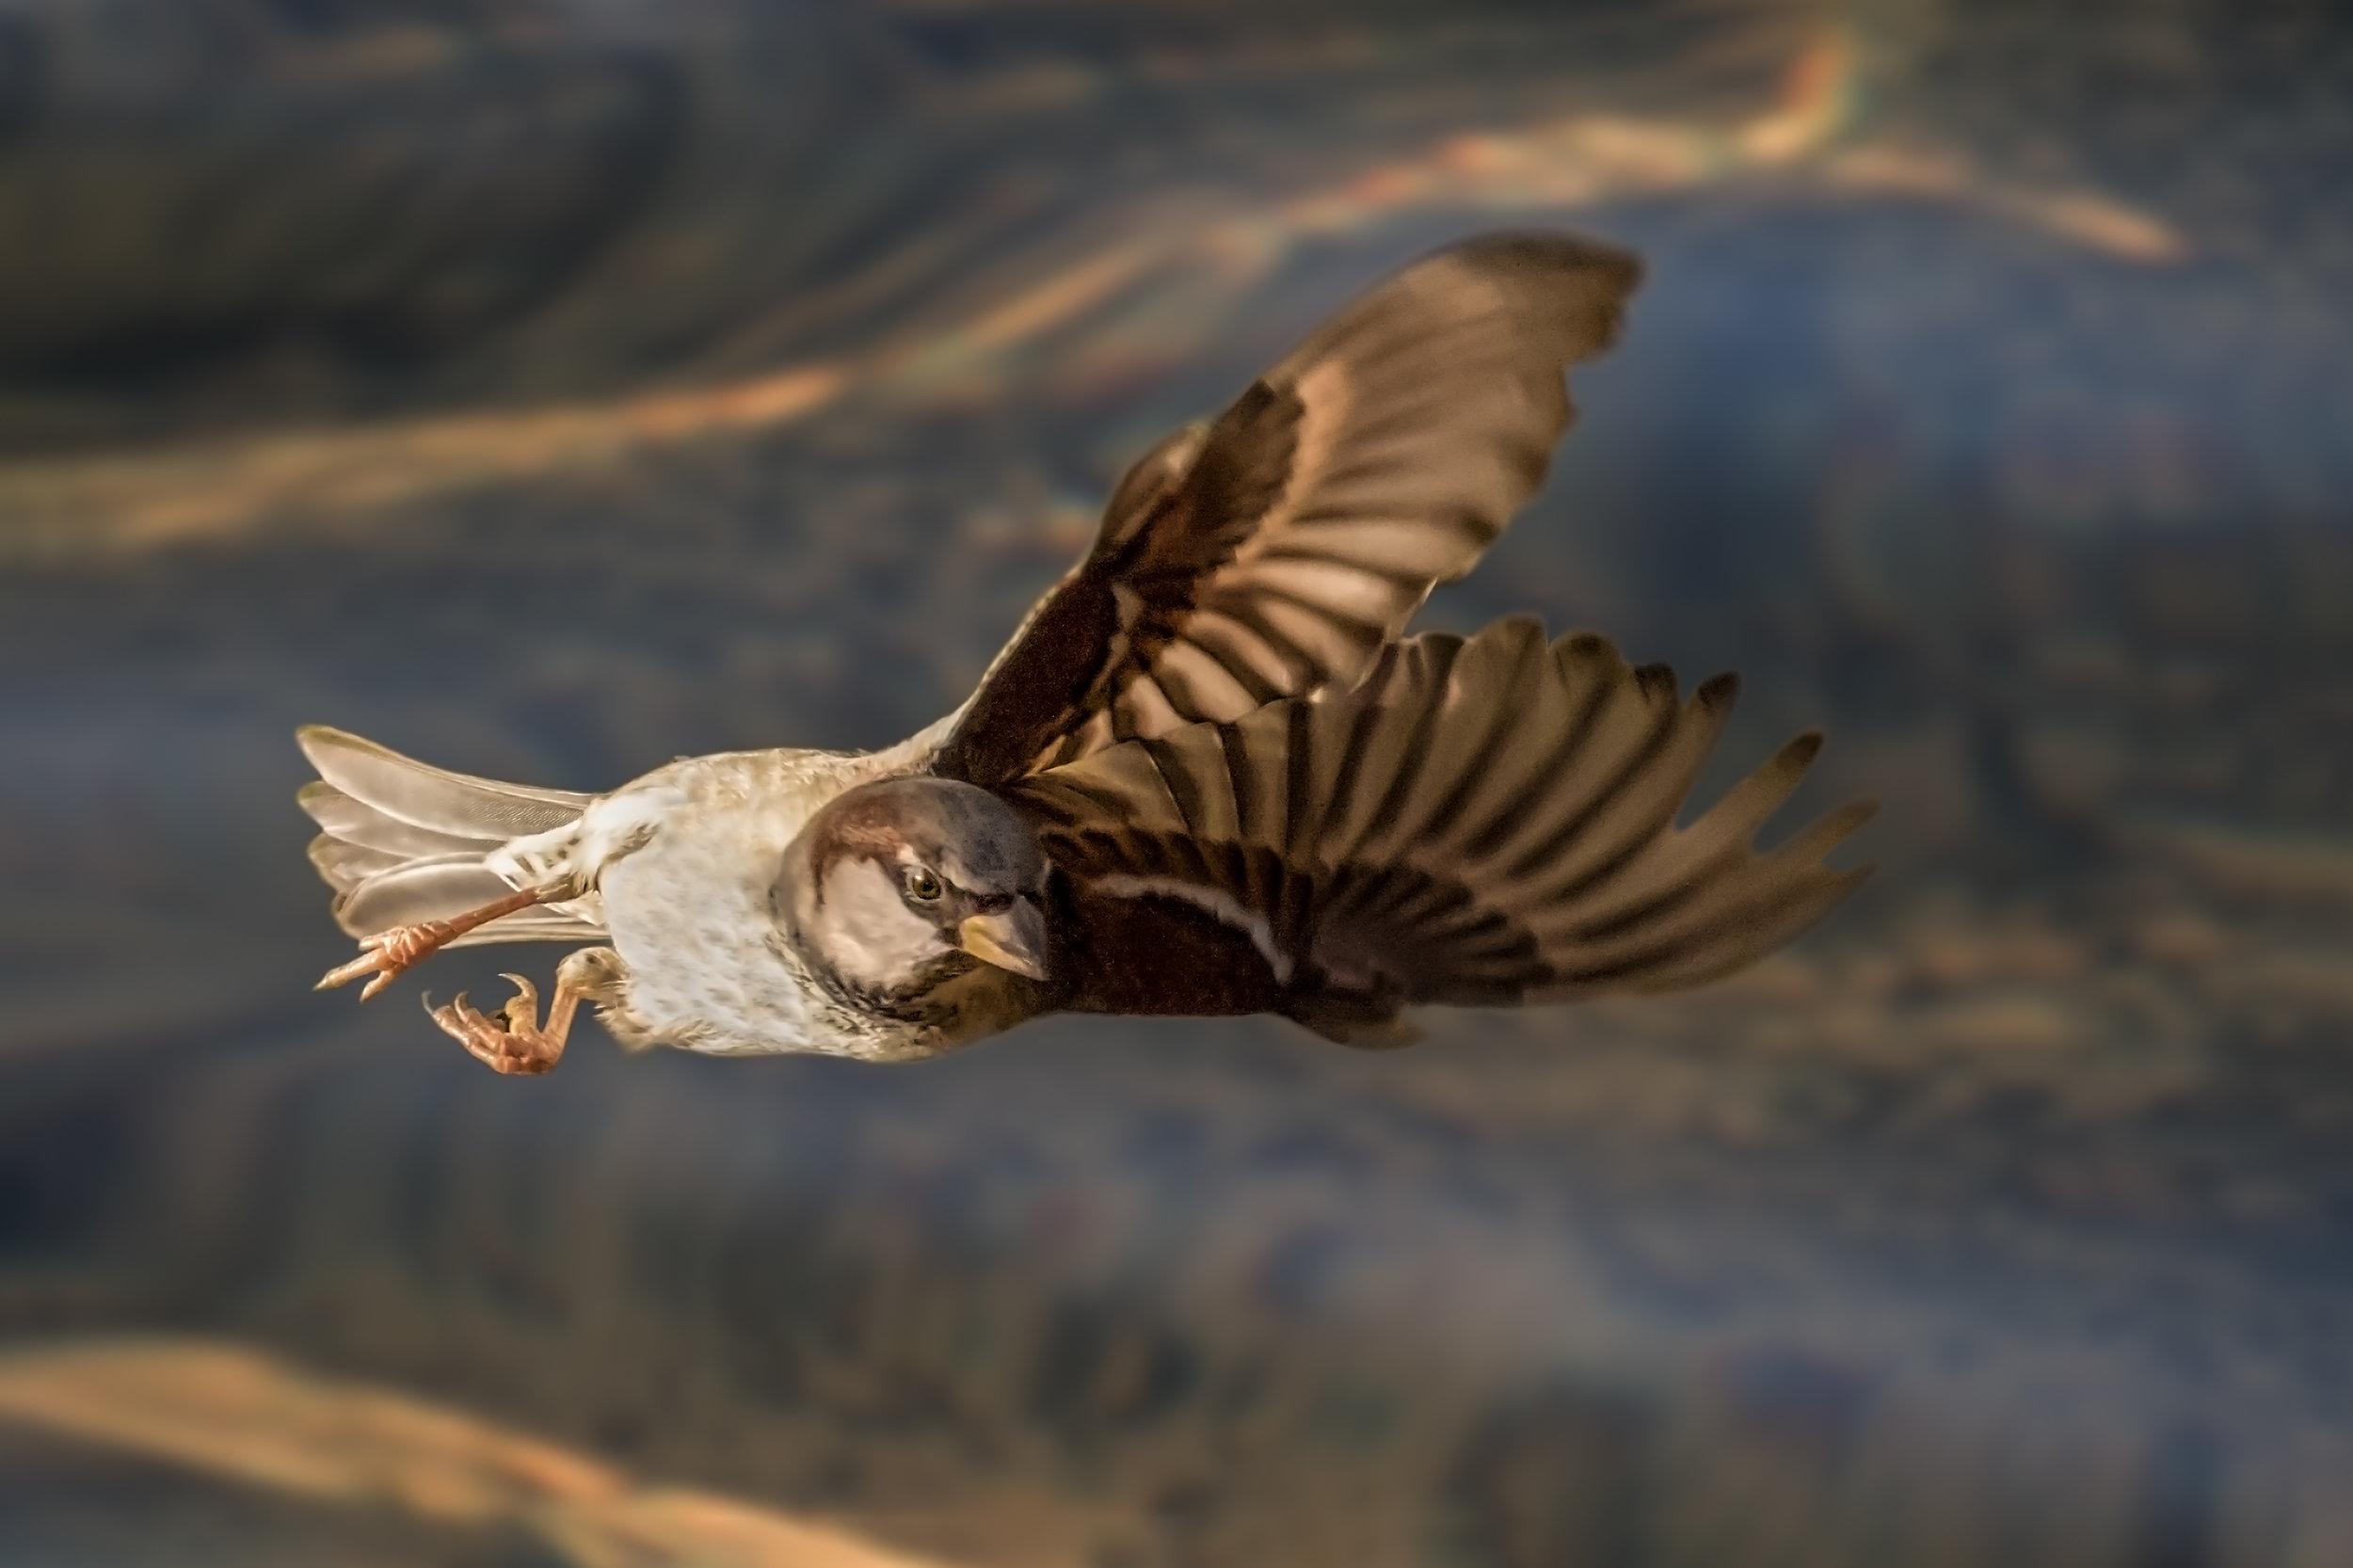 Male Sparrow flight acrobatics #1